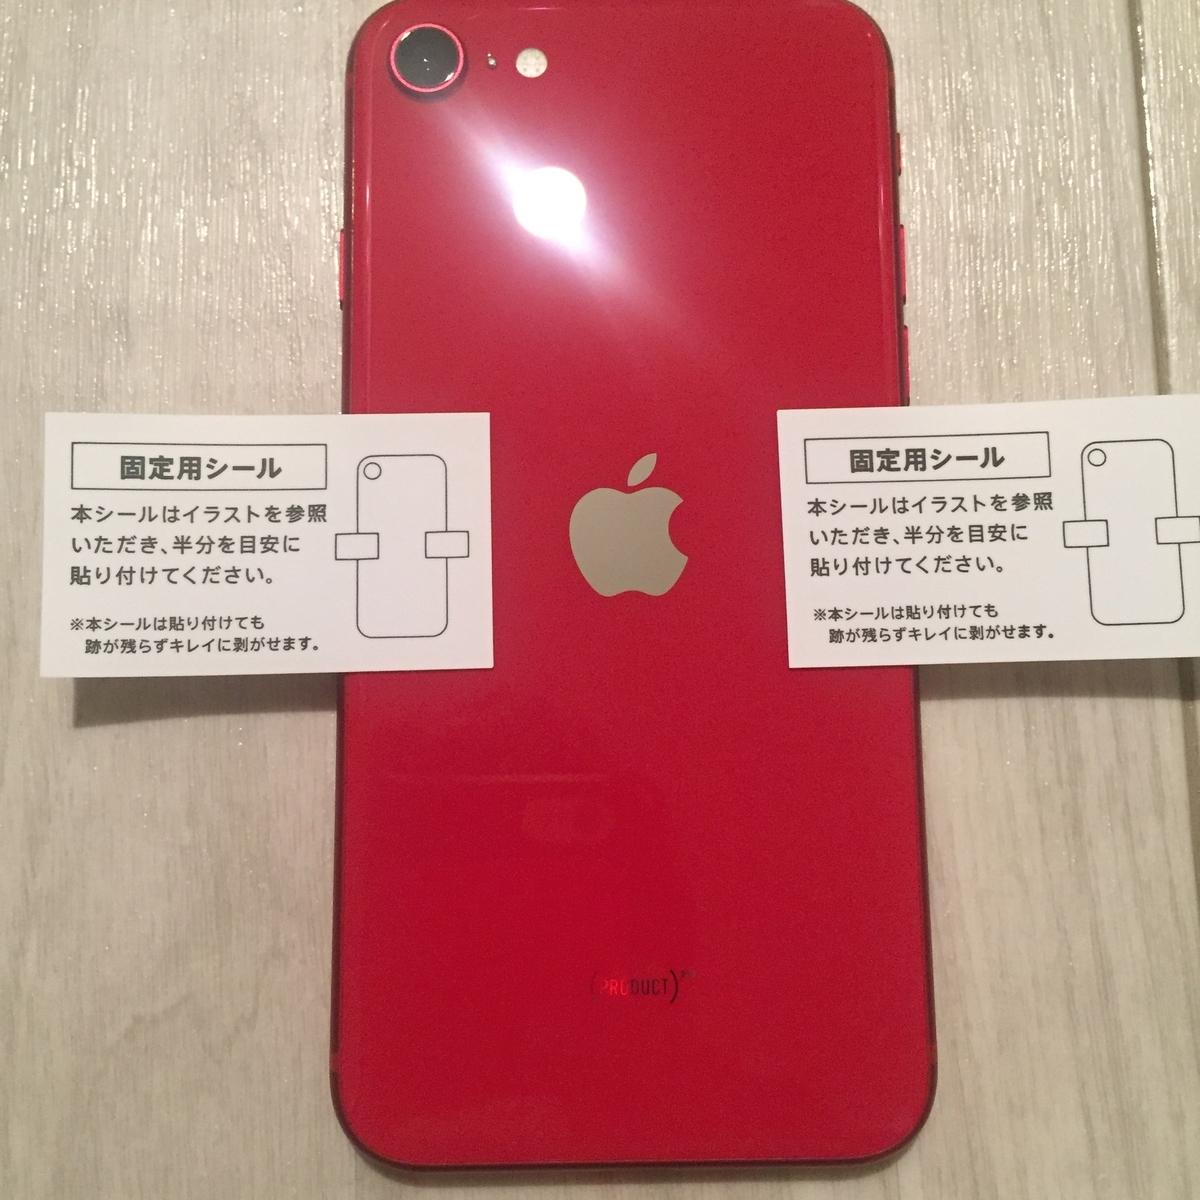 iphone SE 2 第2世代 Apple mac スマホ スマートフォン 携帯